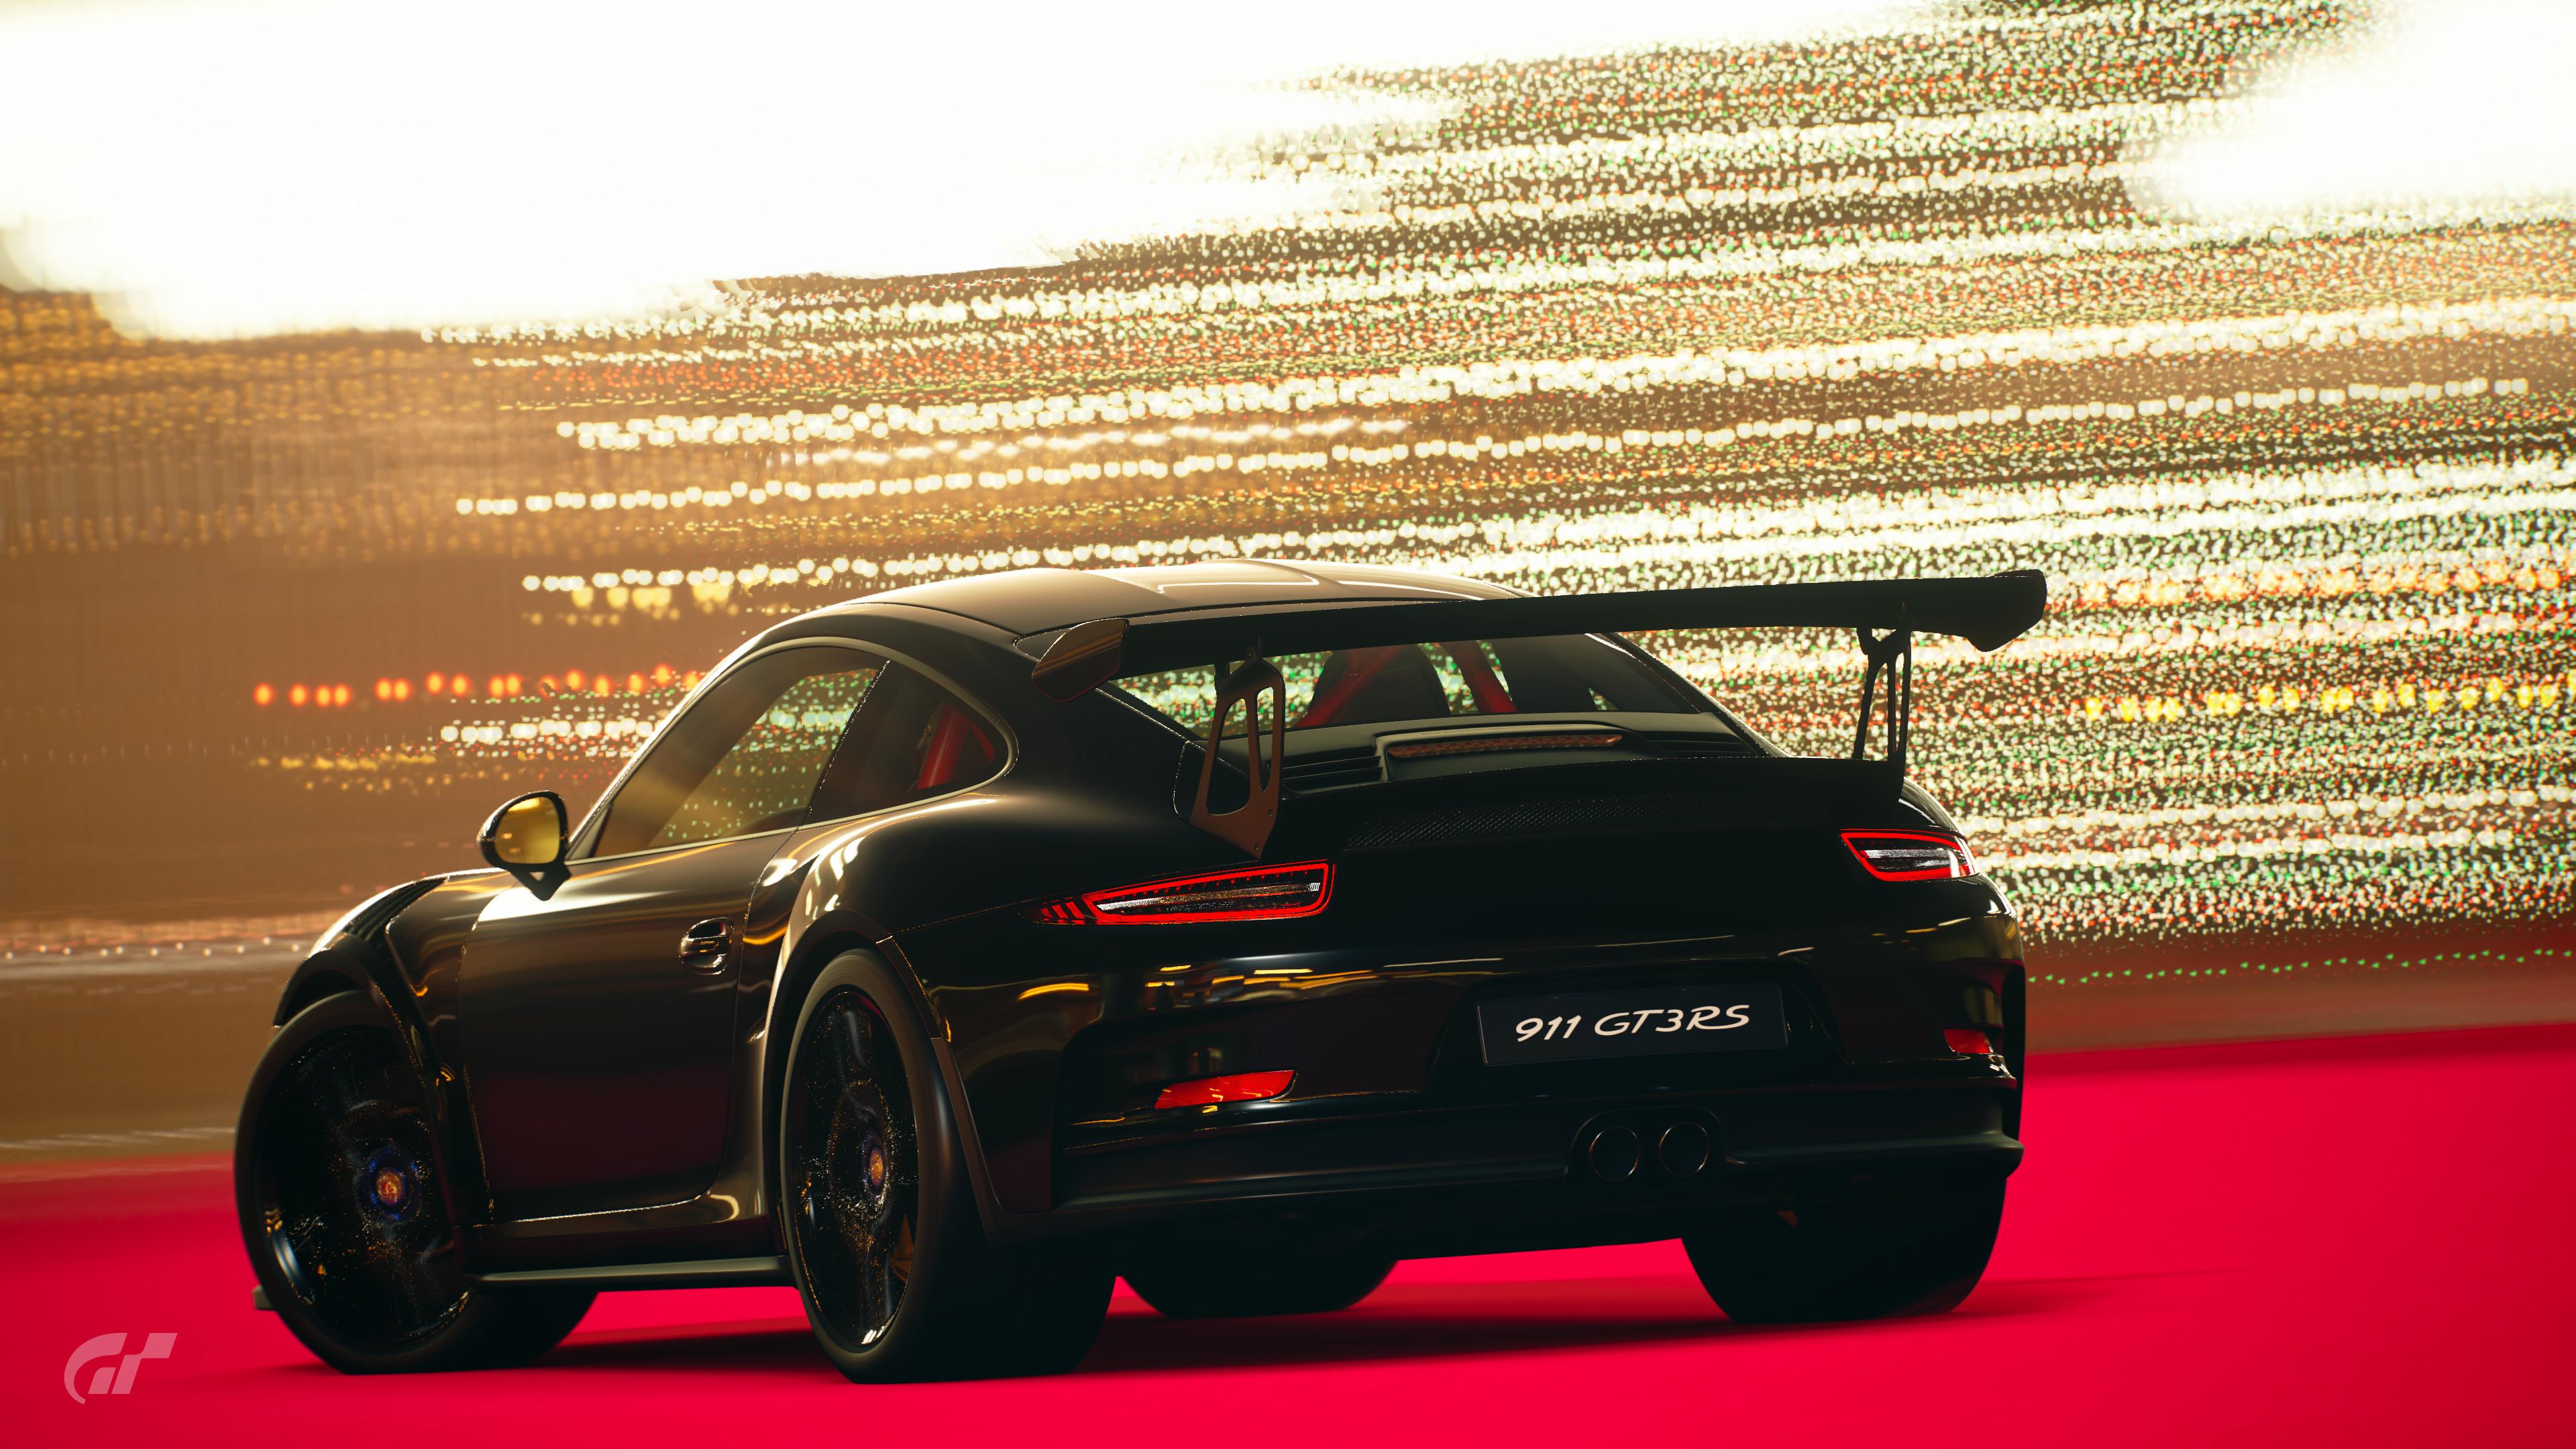 porsche 911 gt3 rs 4k 2019 1547938543 - Porsche 911 GT3 RS 4k 2019 - porsche 911 wallpapers, hd-wallpapers, games wallpapers, 4k-wallpapers